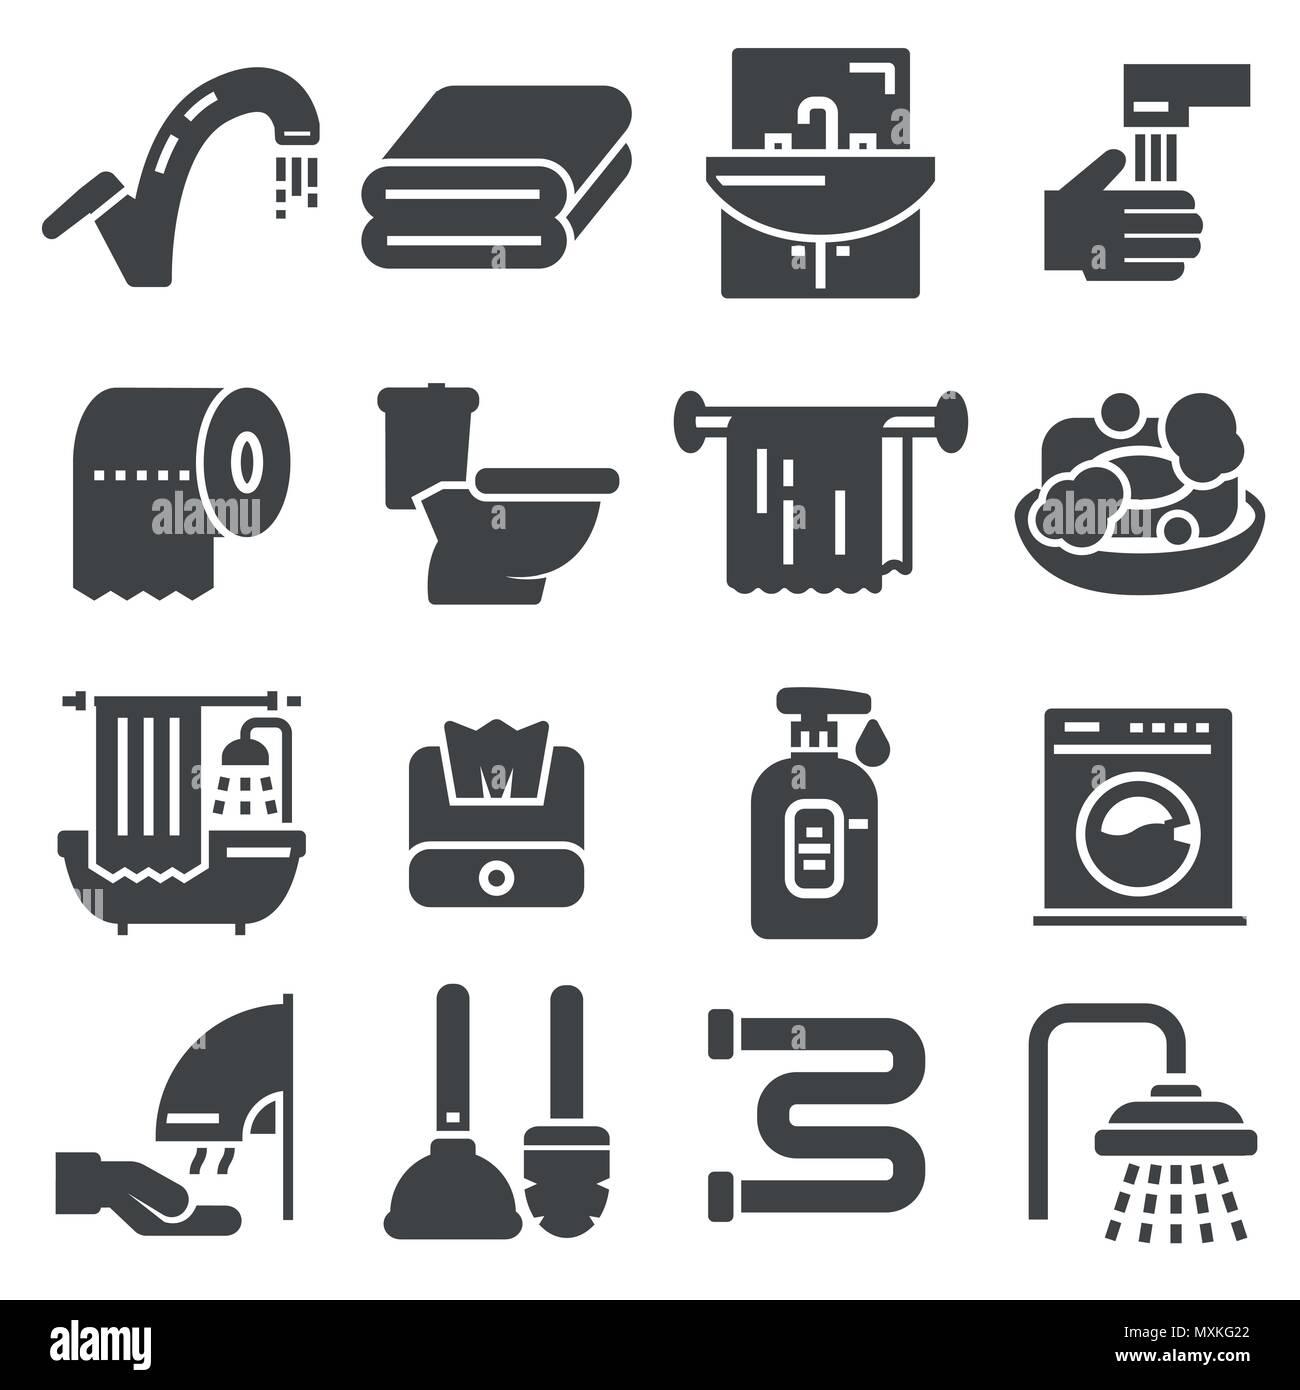 Wc Symbol. Badezimmer Symbol. Toilette Symbol. Vector Illustration